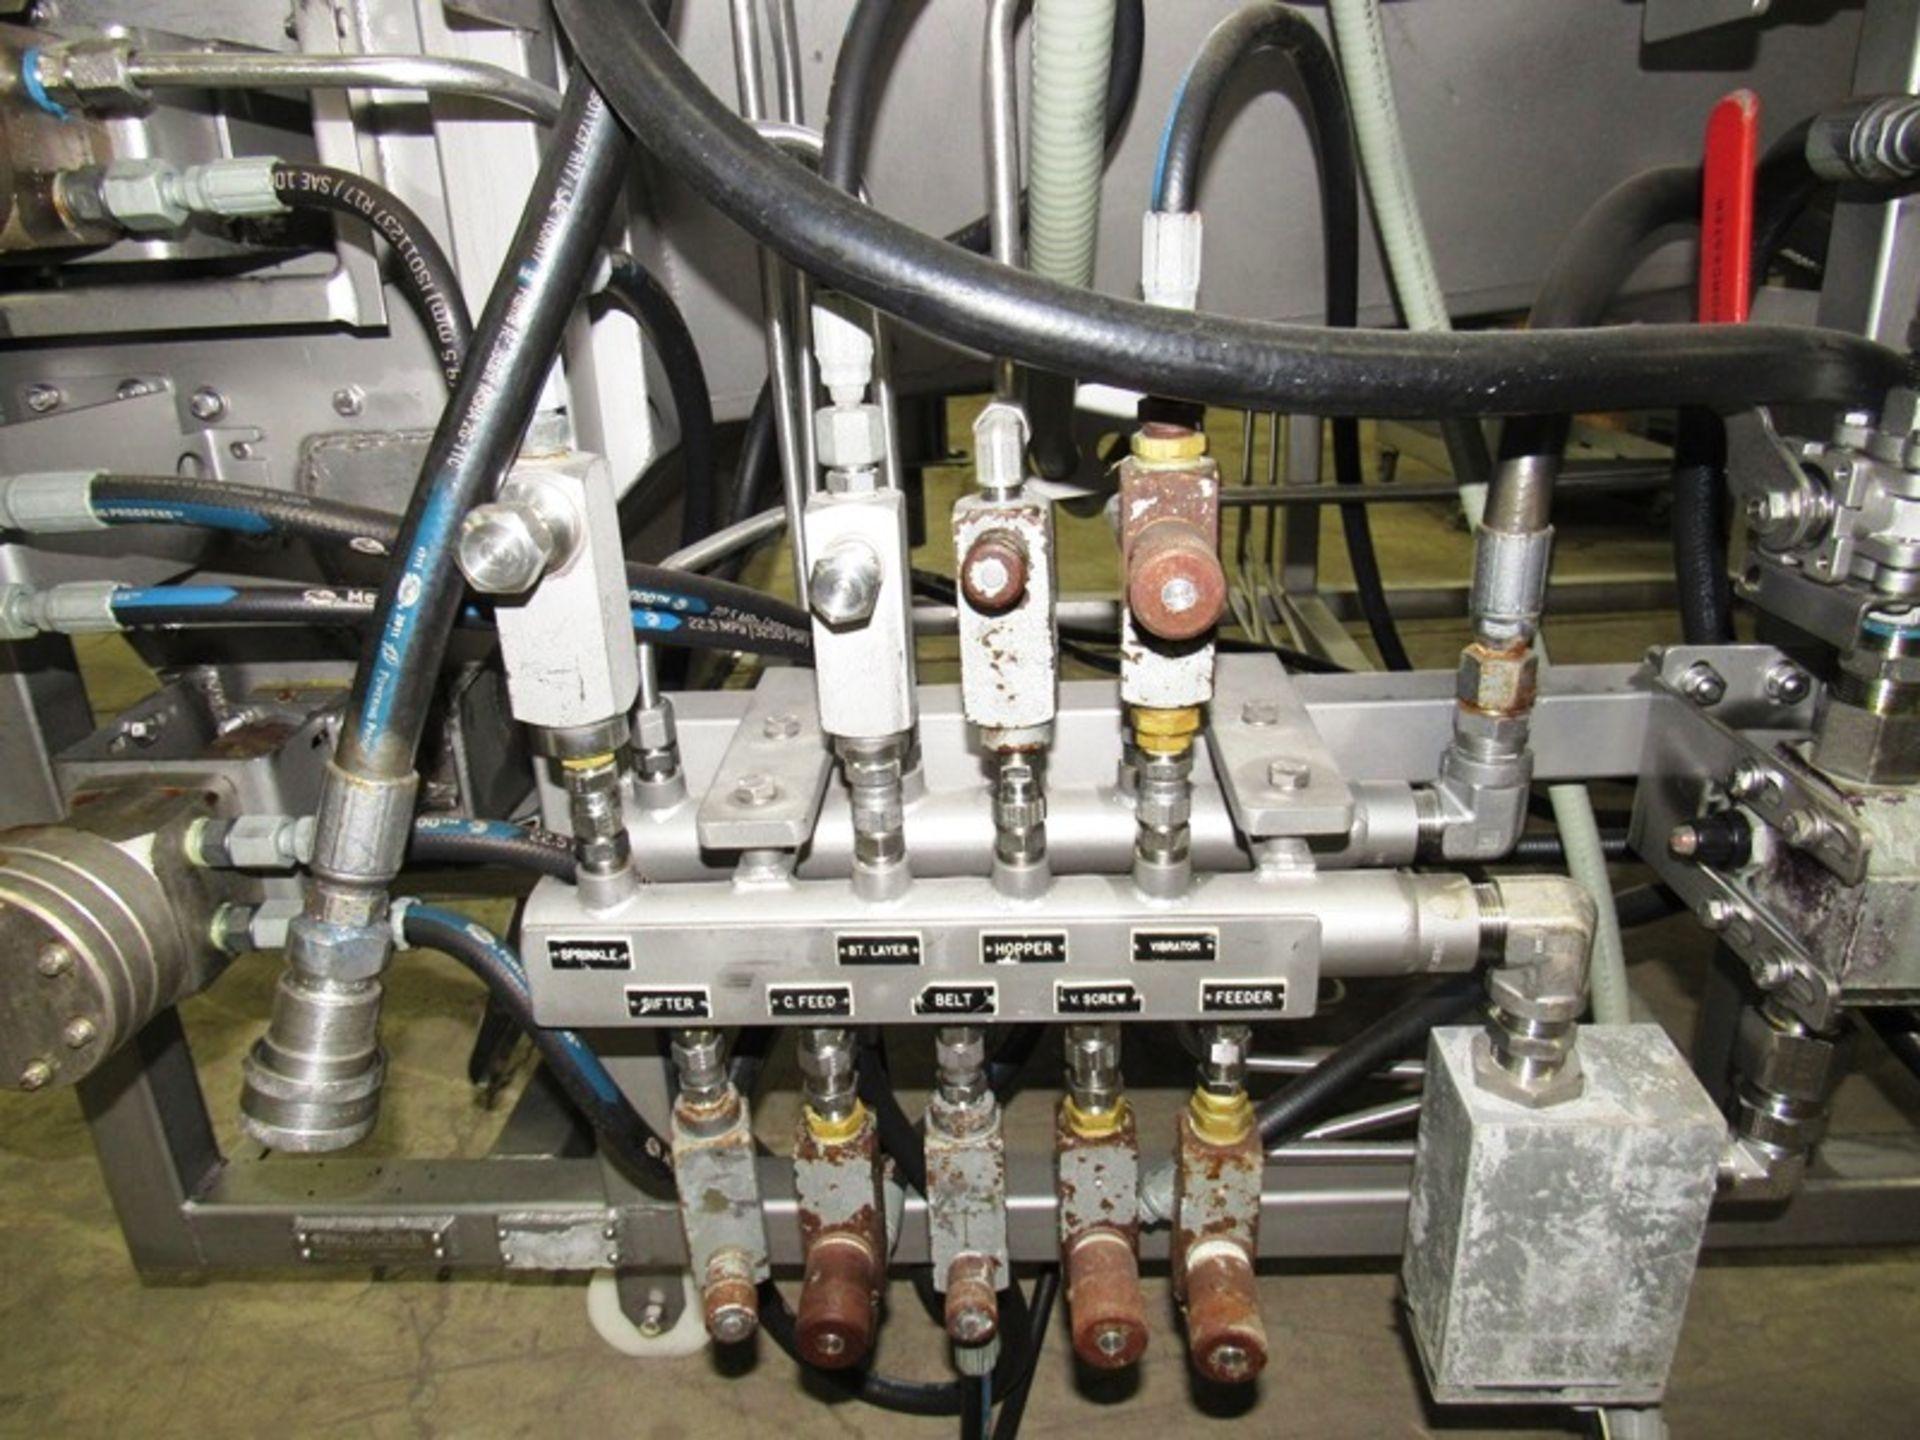 Lot 6 - Stein Mdl. XL-40 Breader, hydraulic drive & controls, Ser. #174 (bent doors)